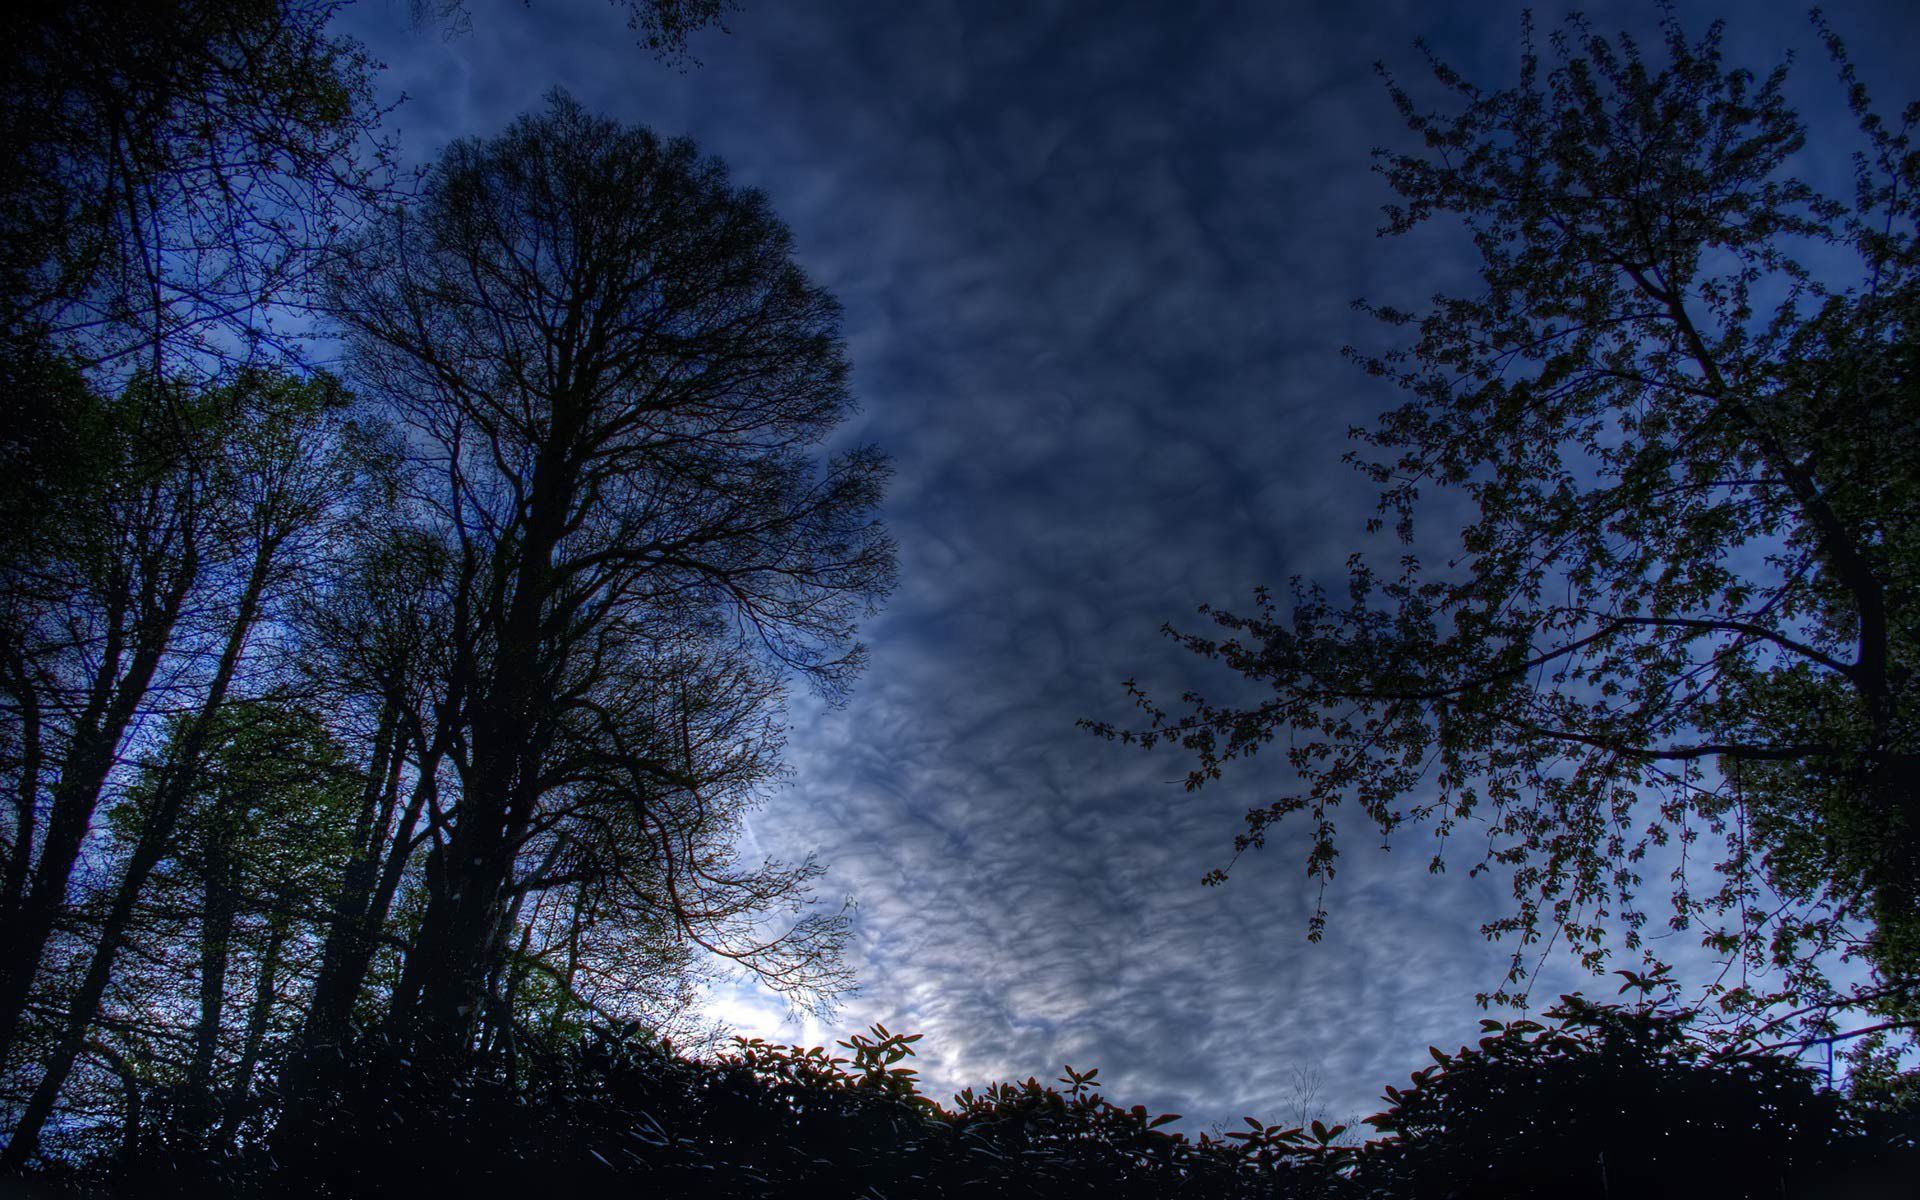 Sextion Bts Night Sky Wallpaper Nature Photography Sky